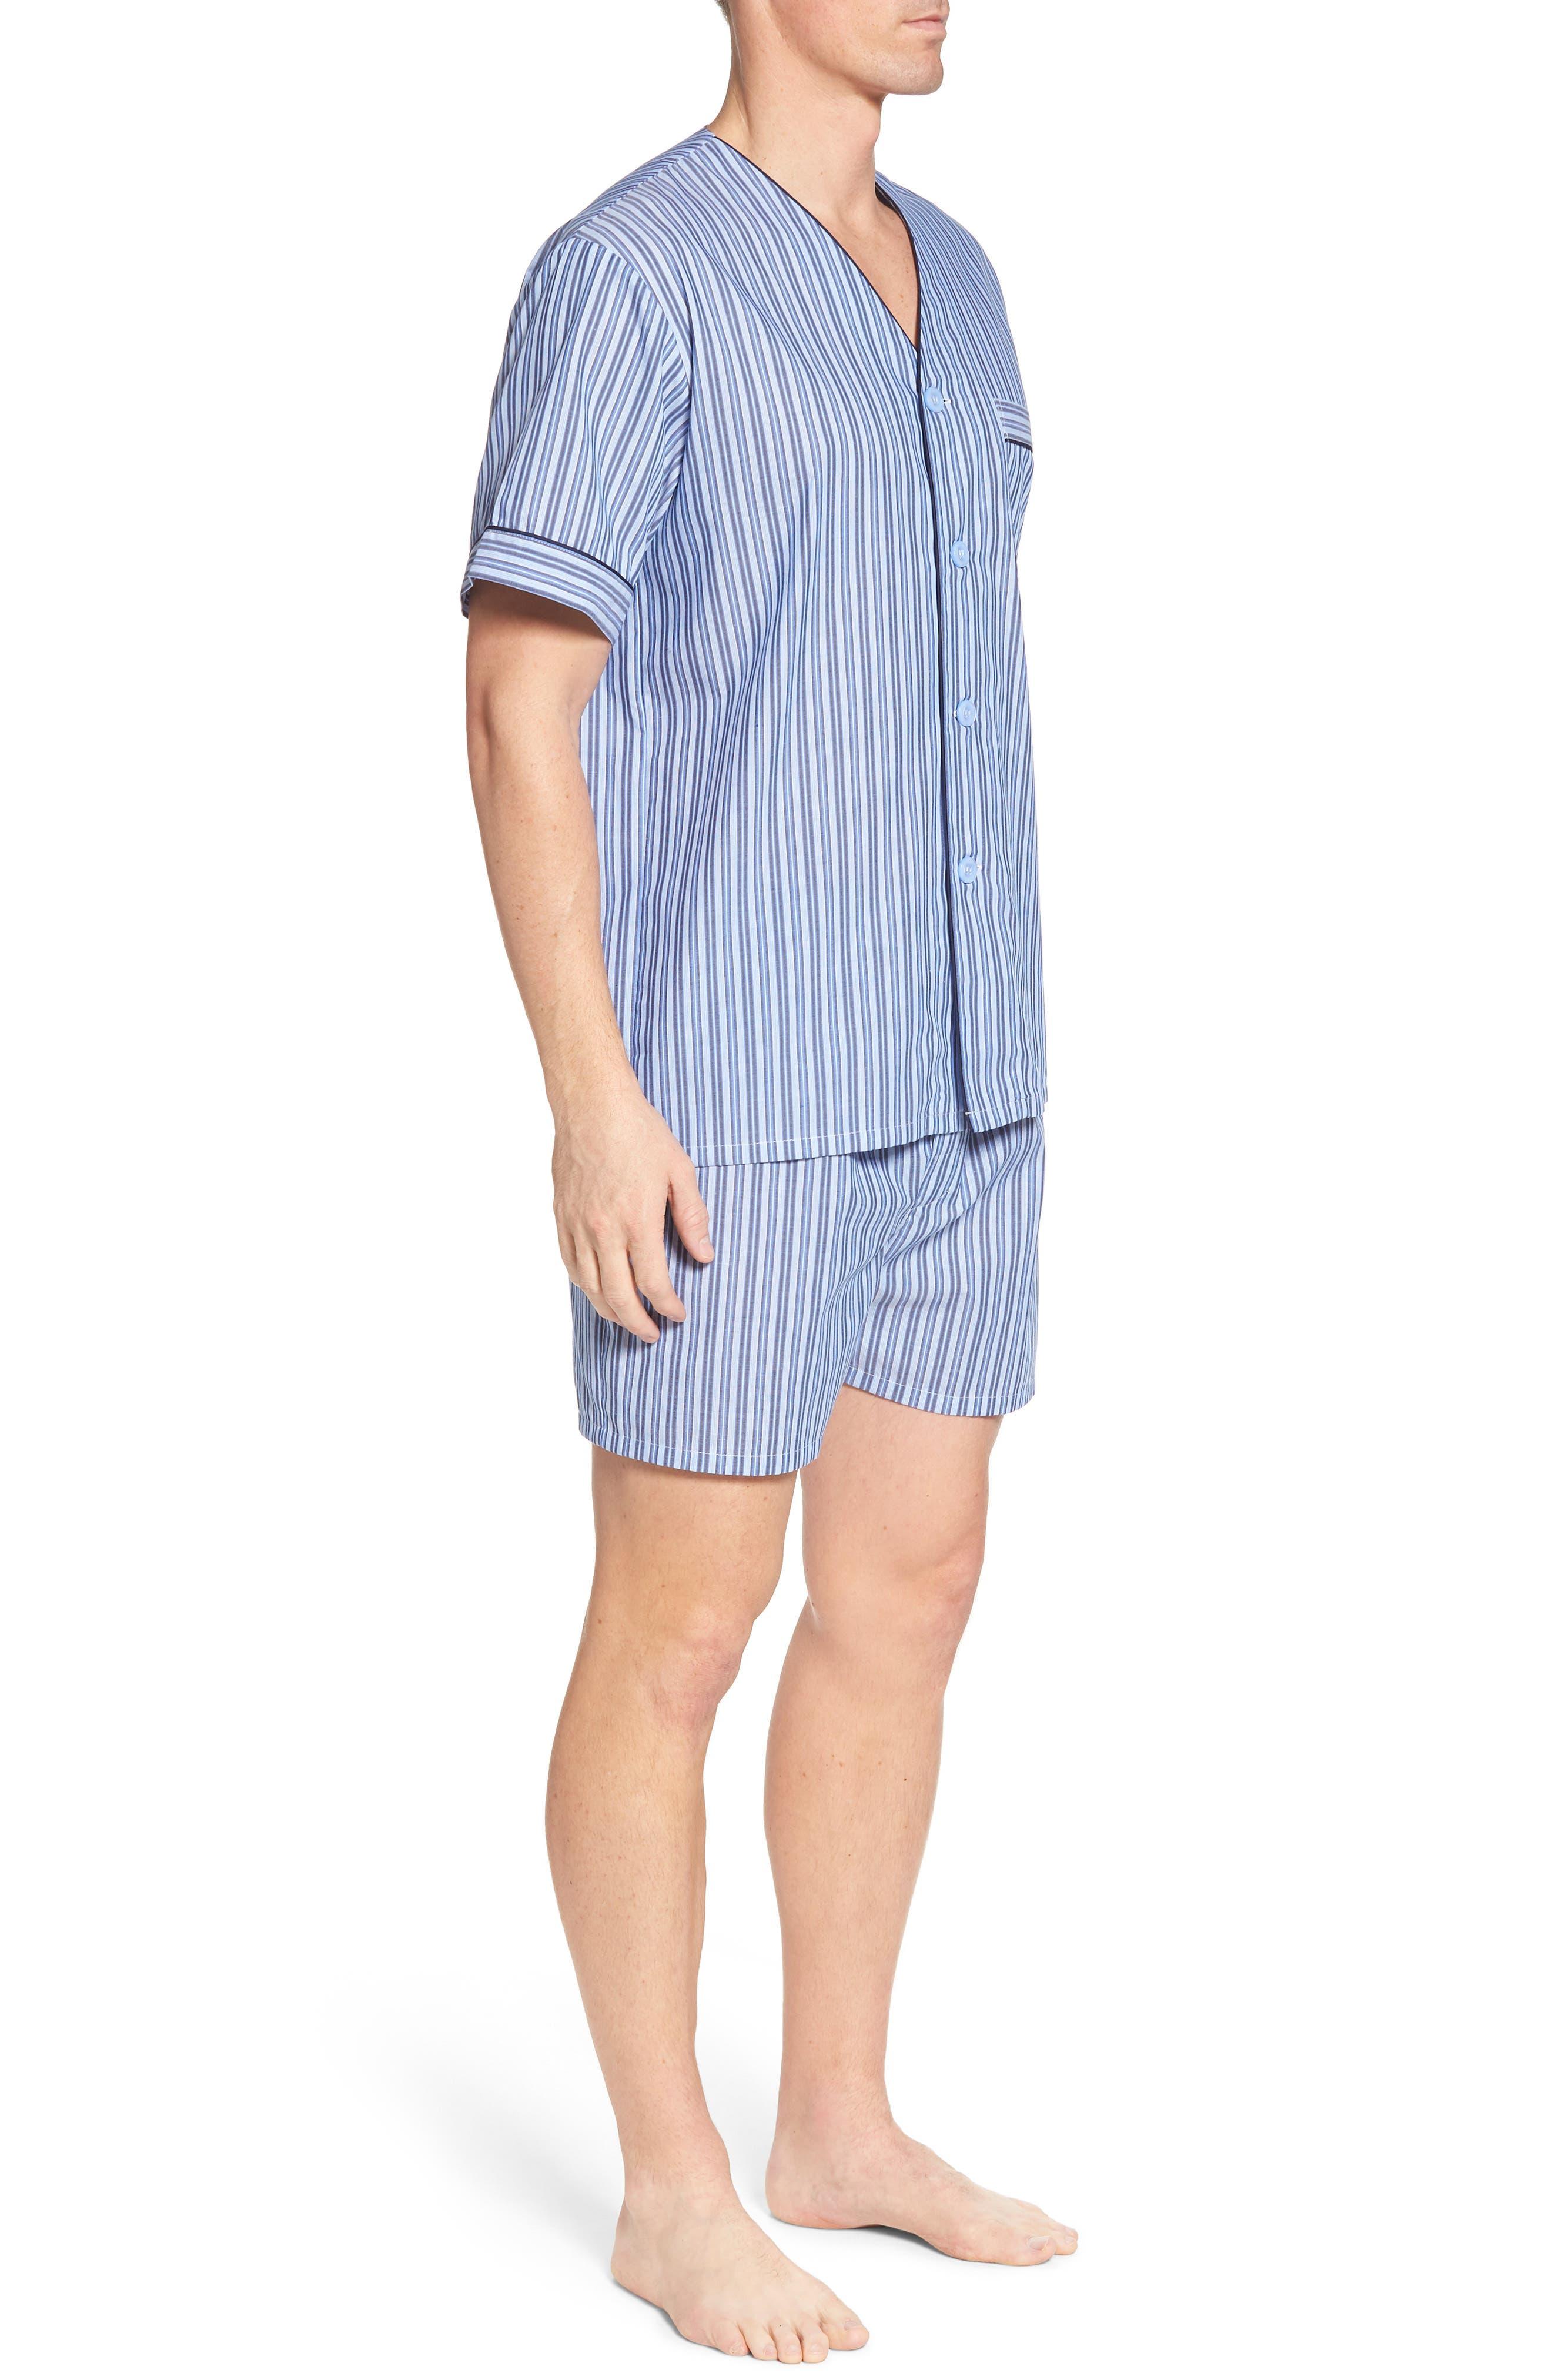 Carefree Shorty Pajama Set,                             Alternate thumbnail 3, color,                             BLUE STRIPE